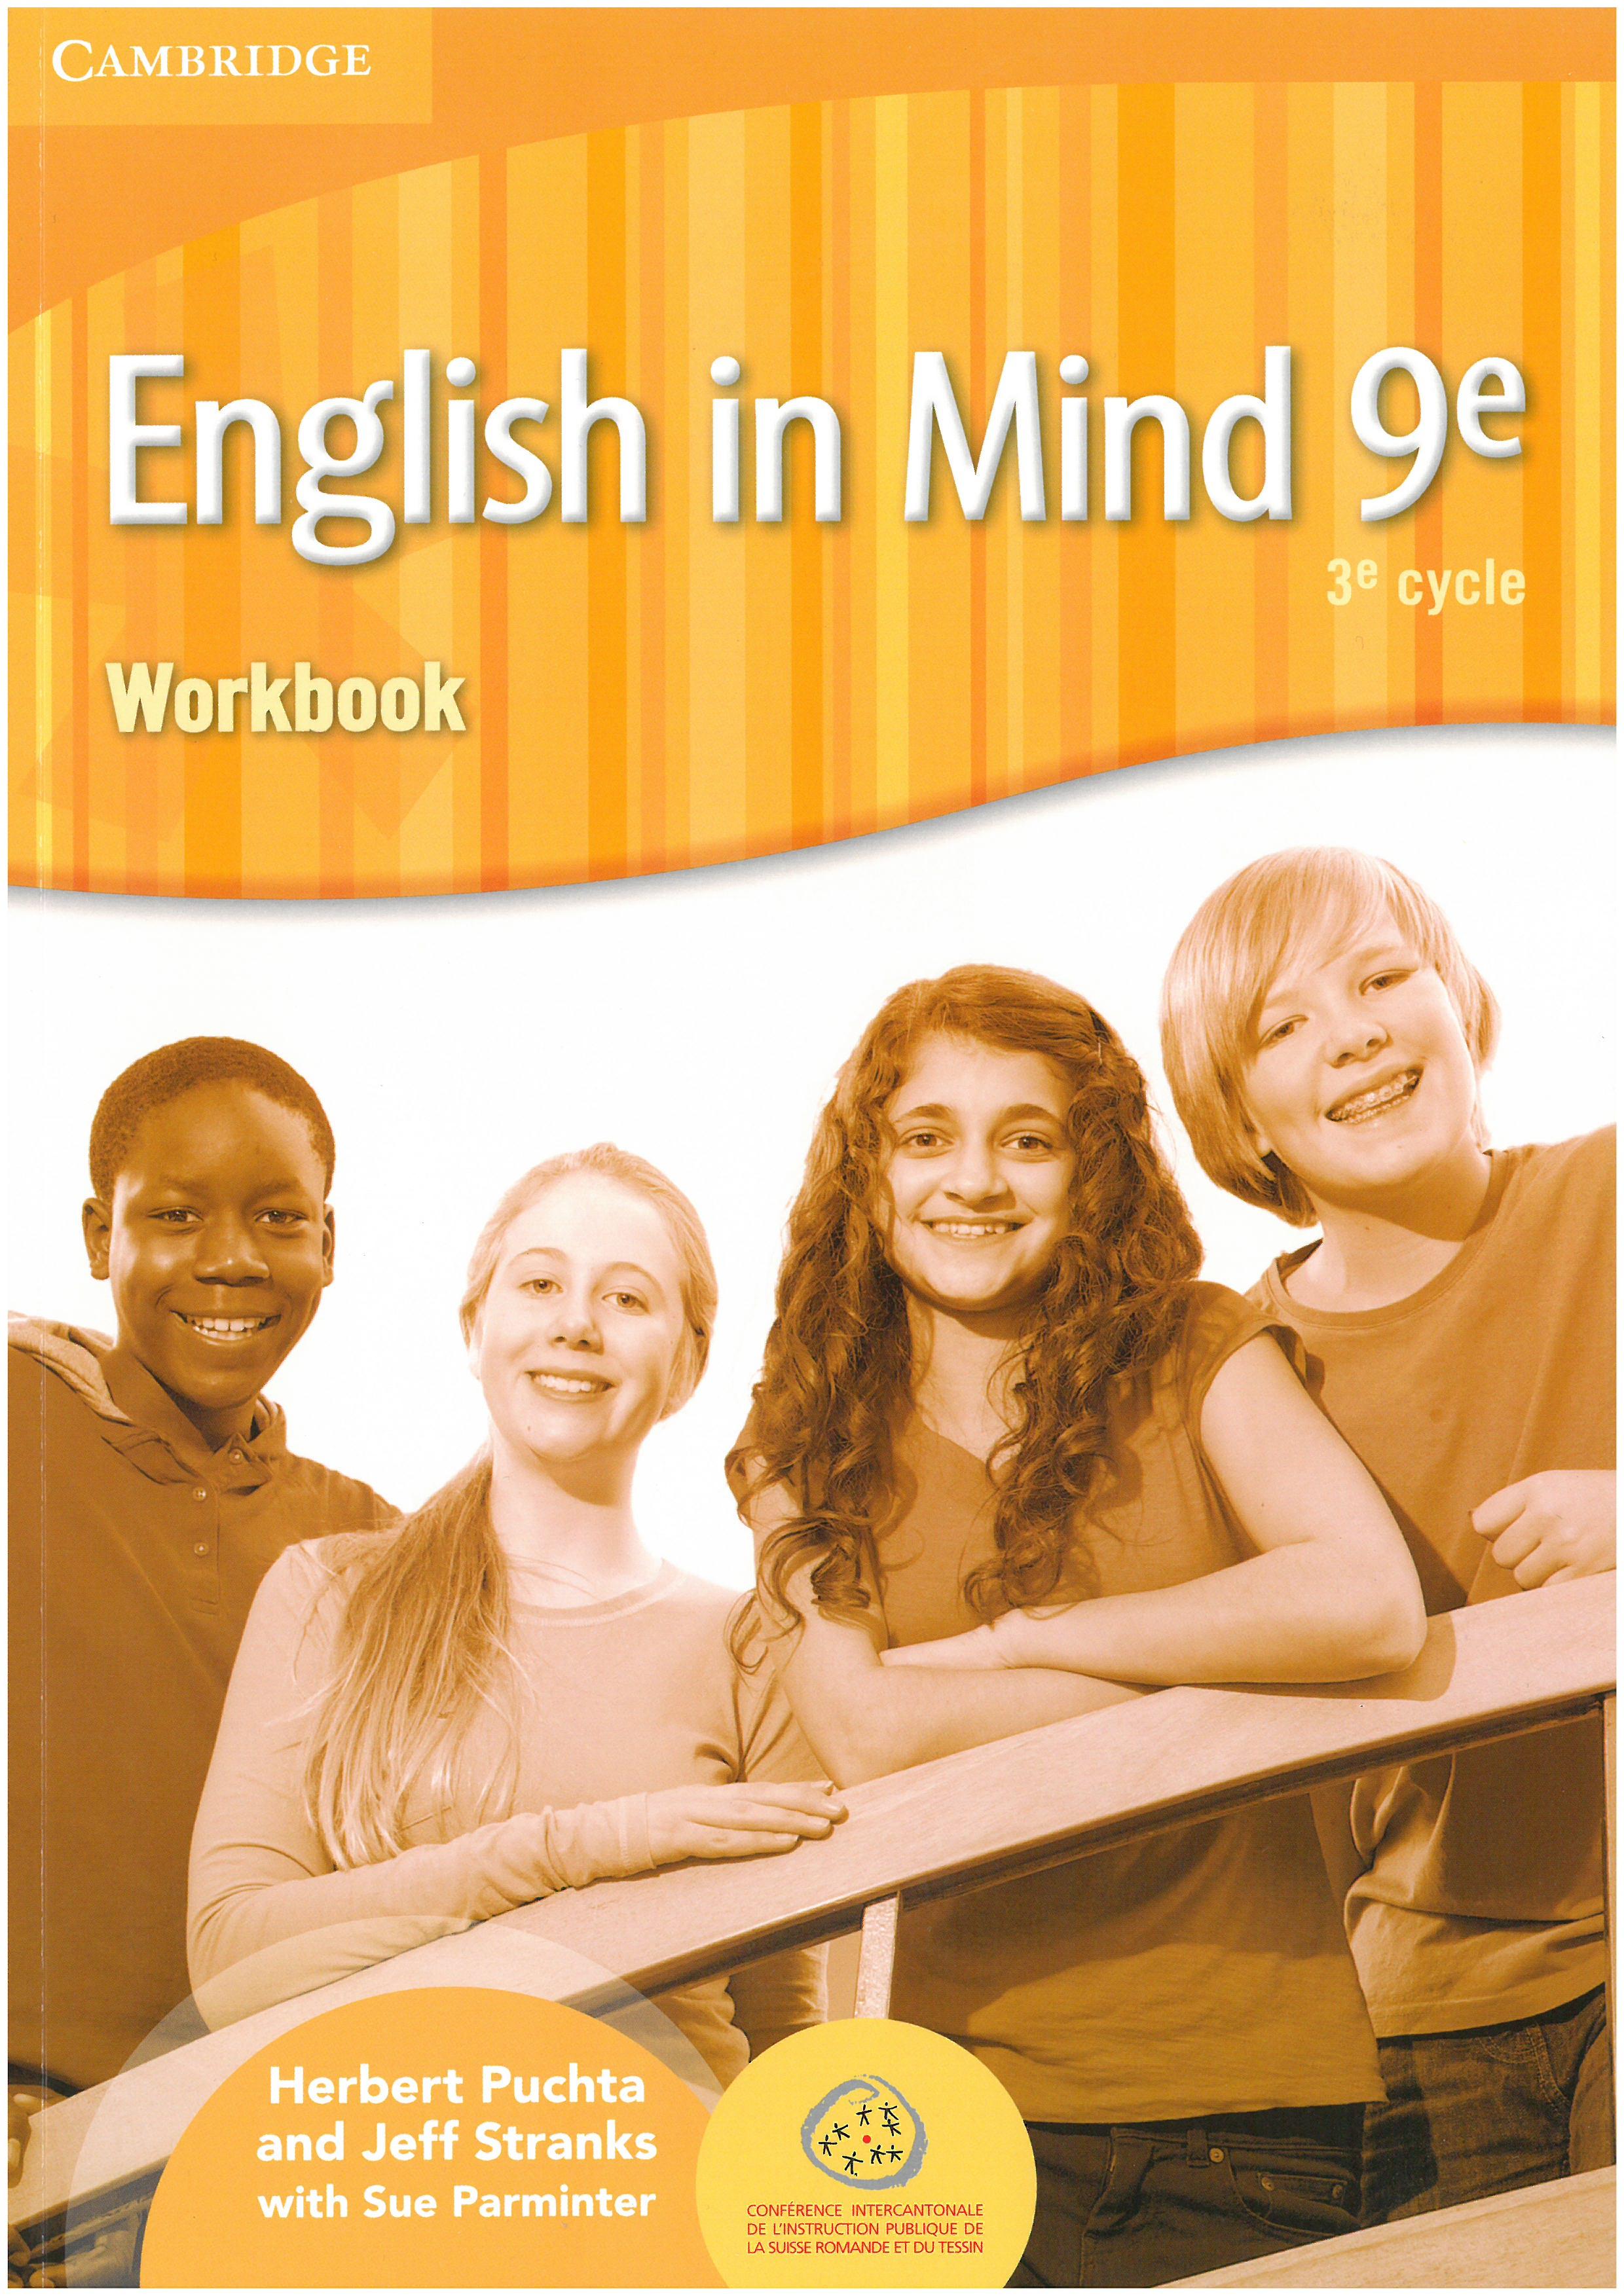 ENGLISH IN MIND 9e Folder | Quizlet